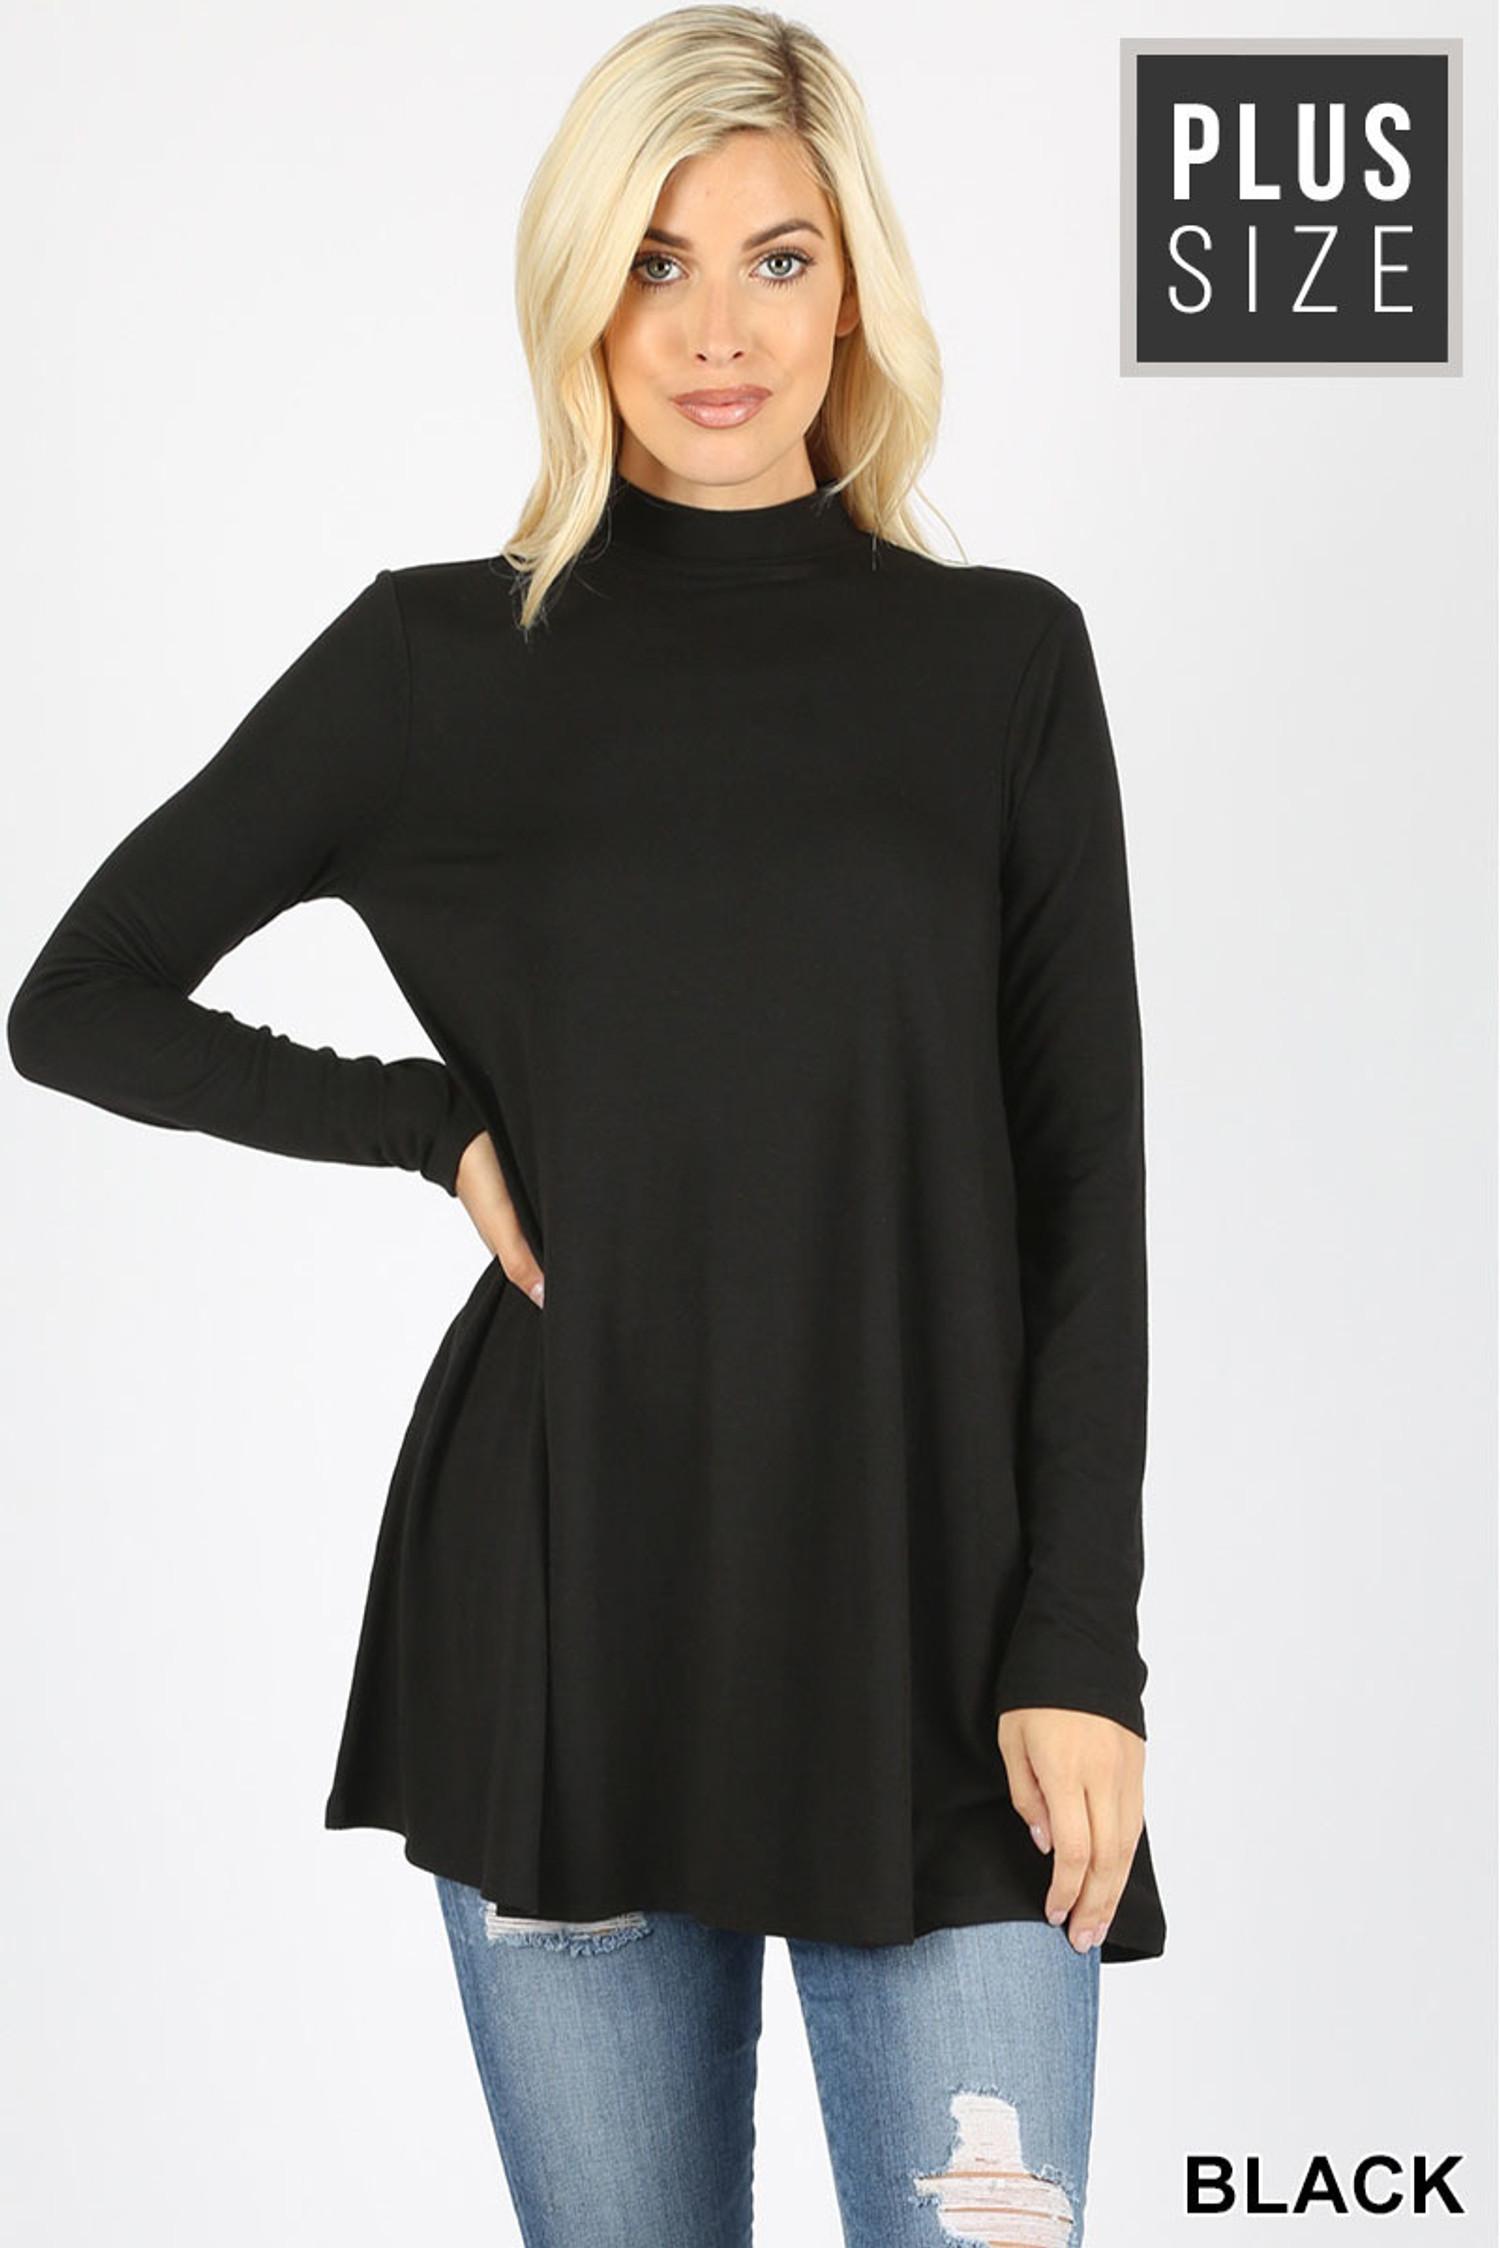 Front image of Black Long Sleeve Mock Neck Plus Size Top